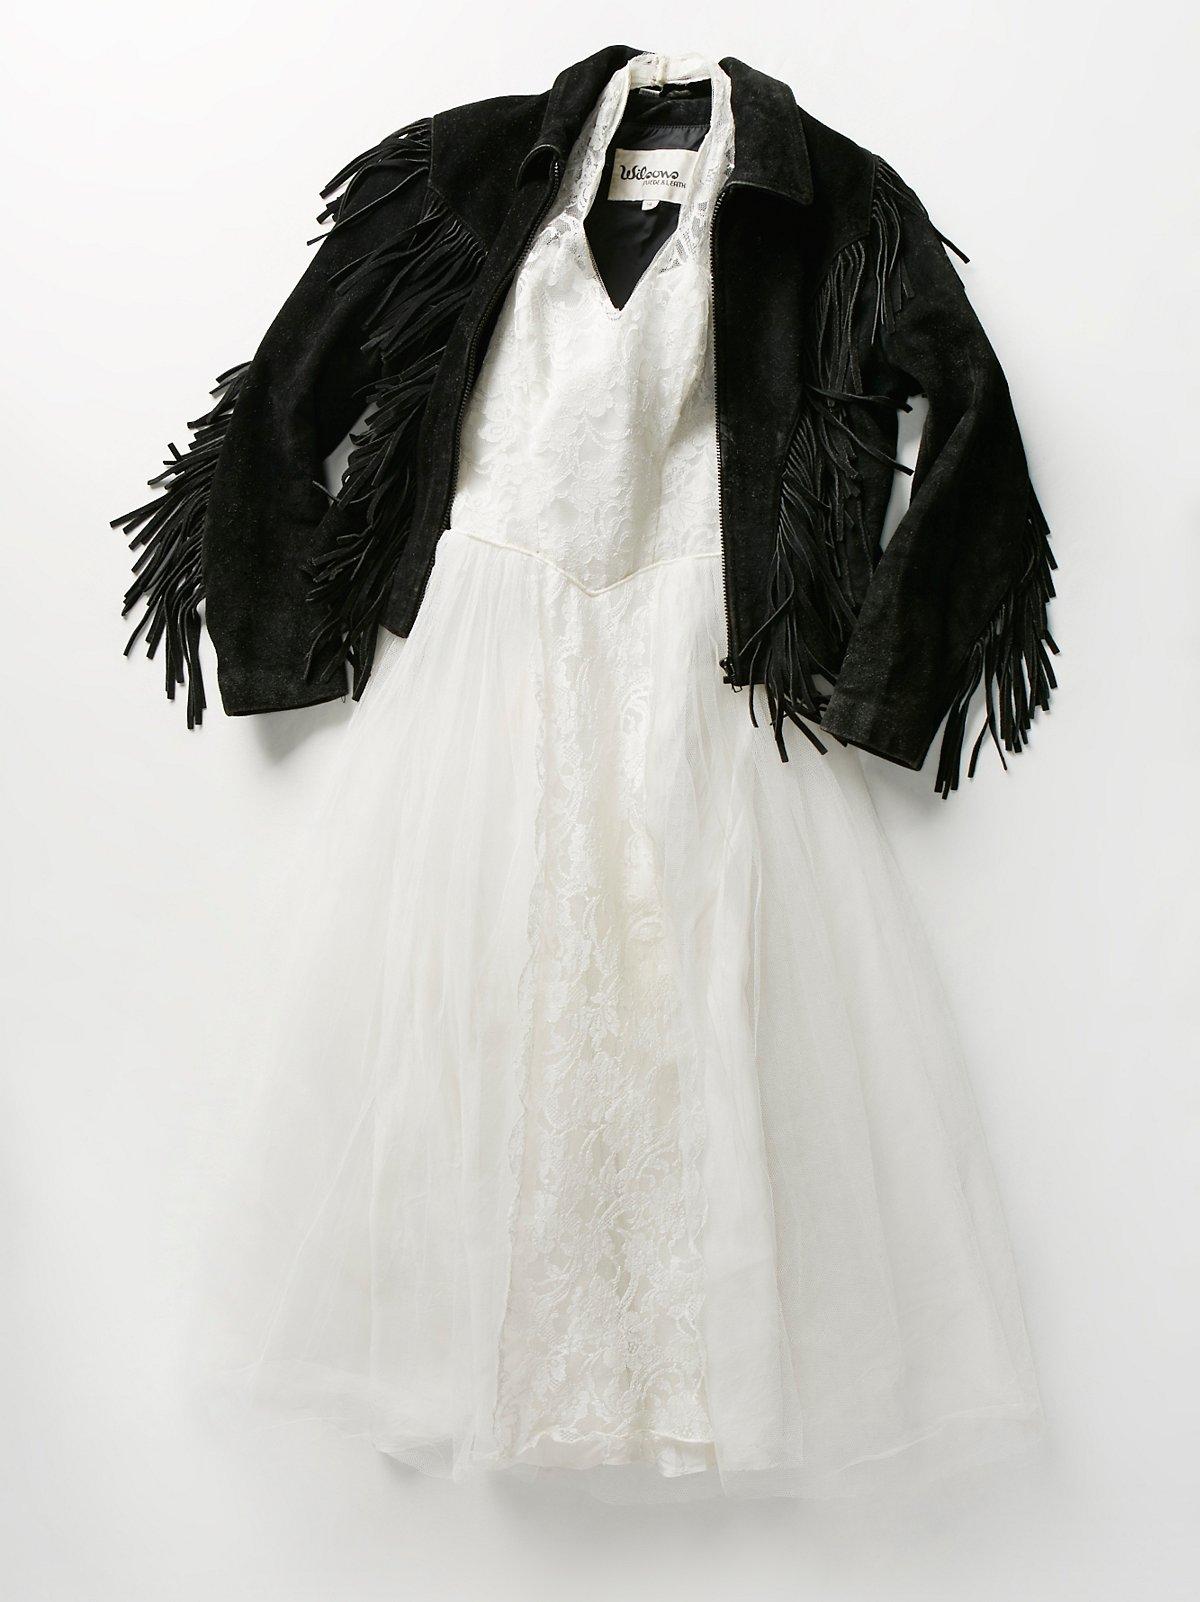 Vintage 1950s Lace Halter Dress